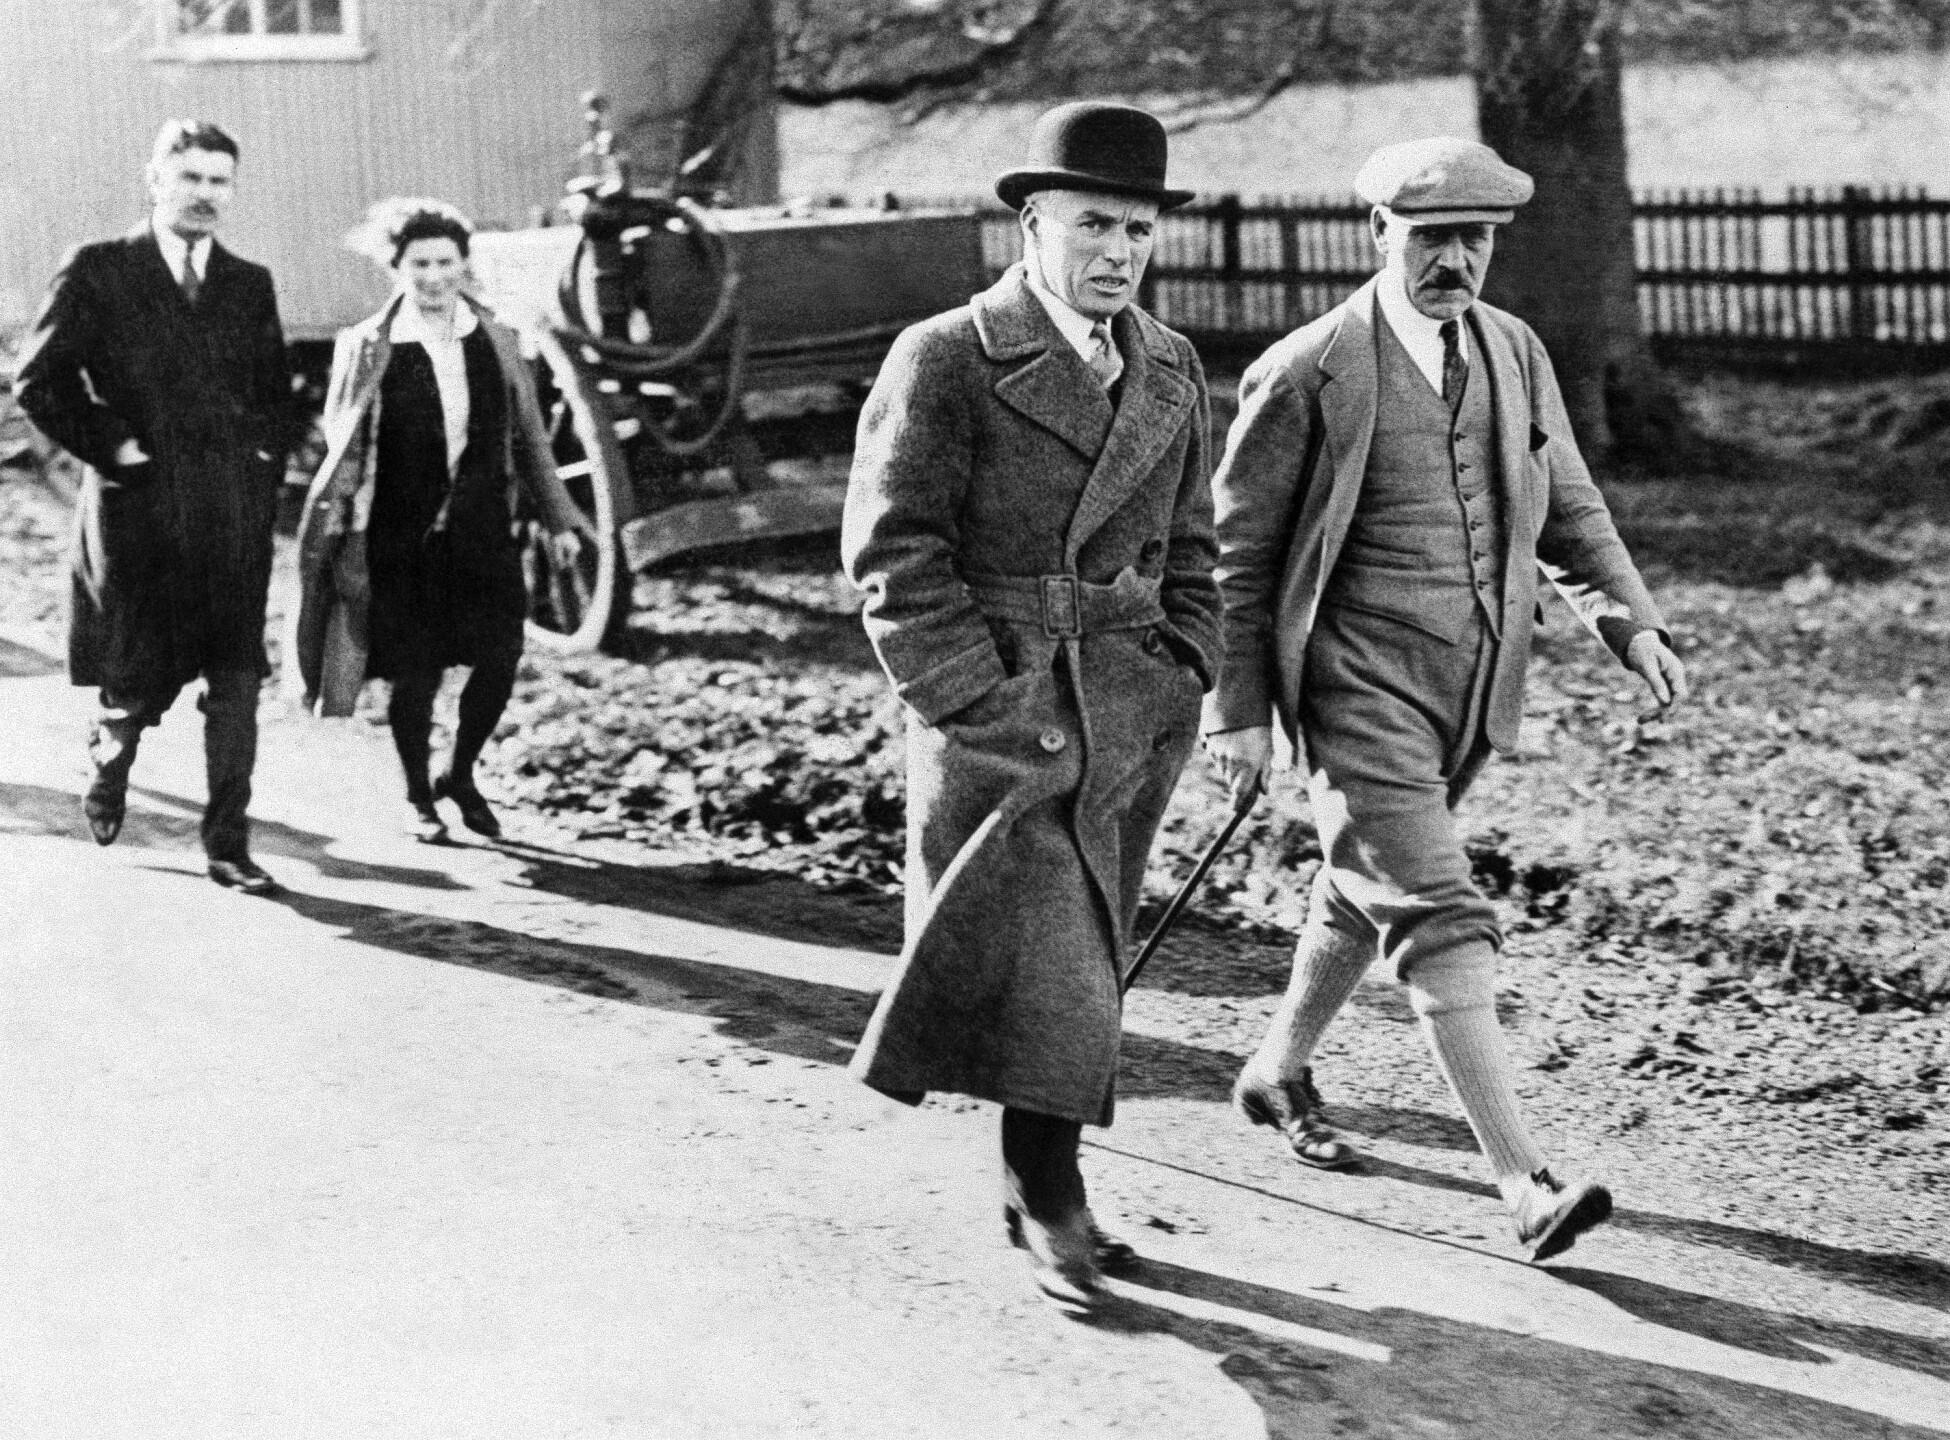 Charlie Chaplin, Ramsay MacDonald